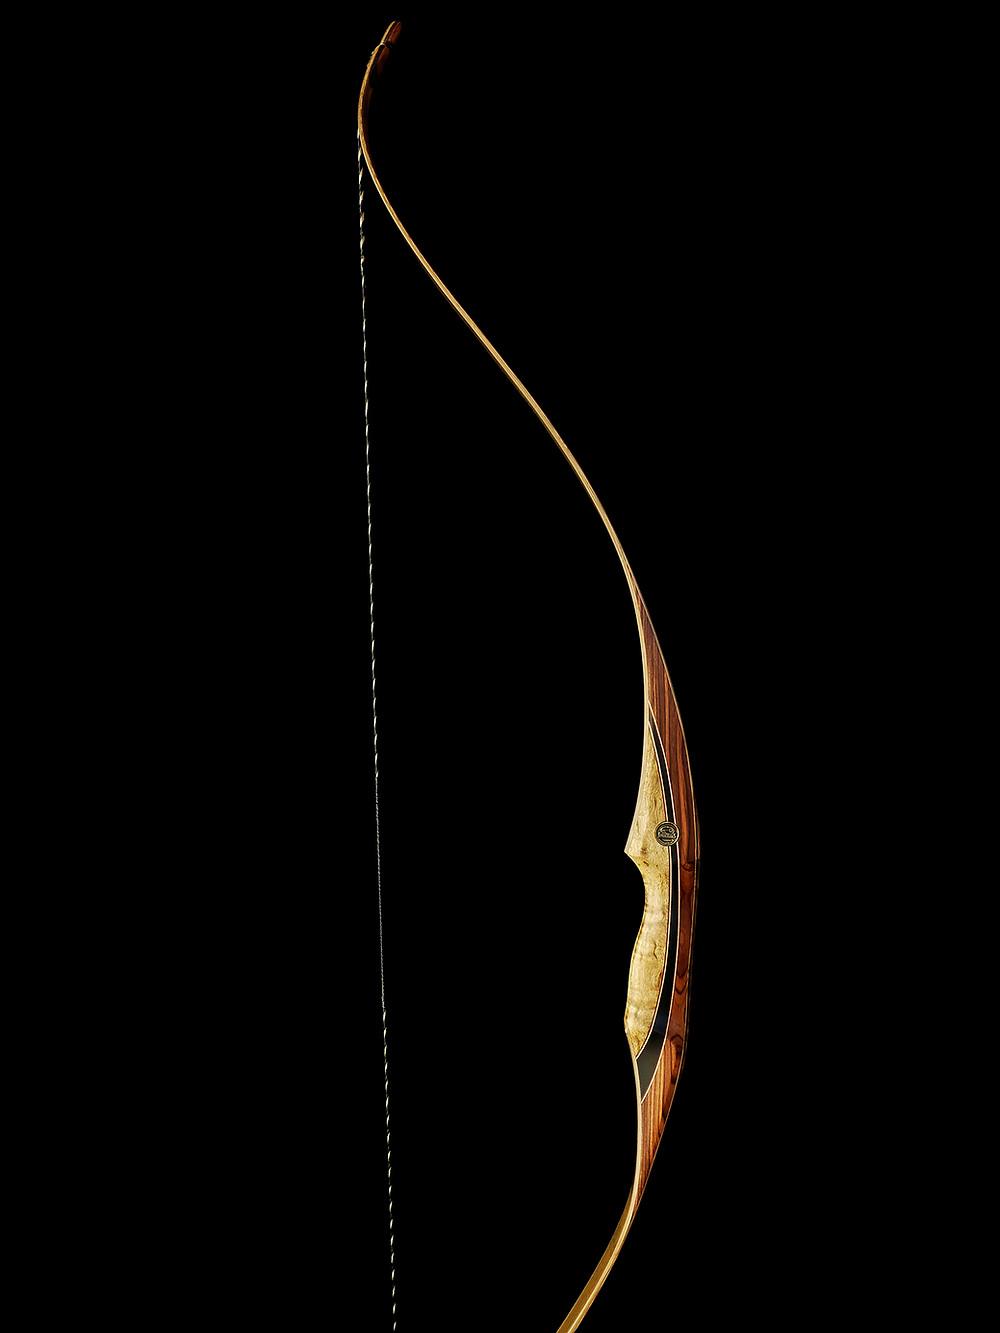 The Swift Long Curve